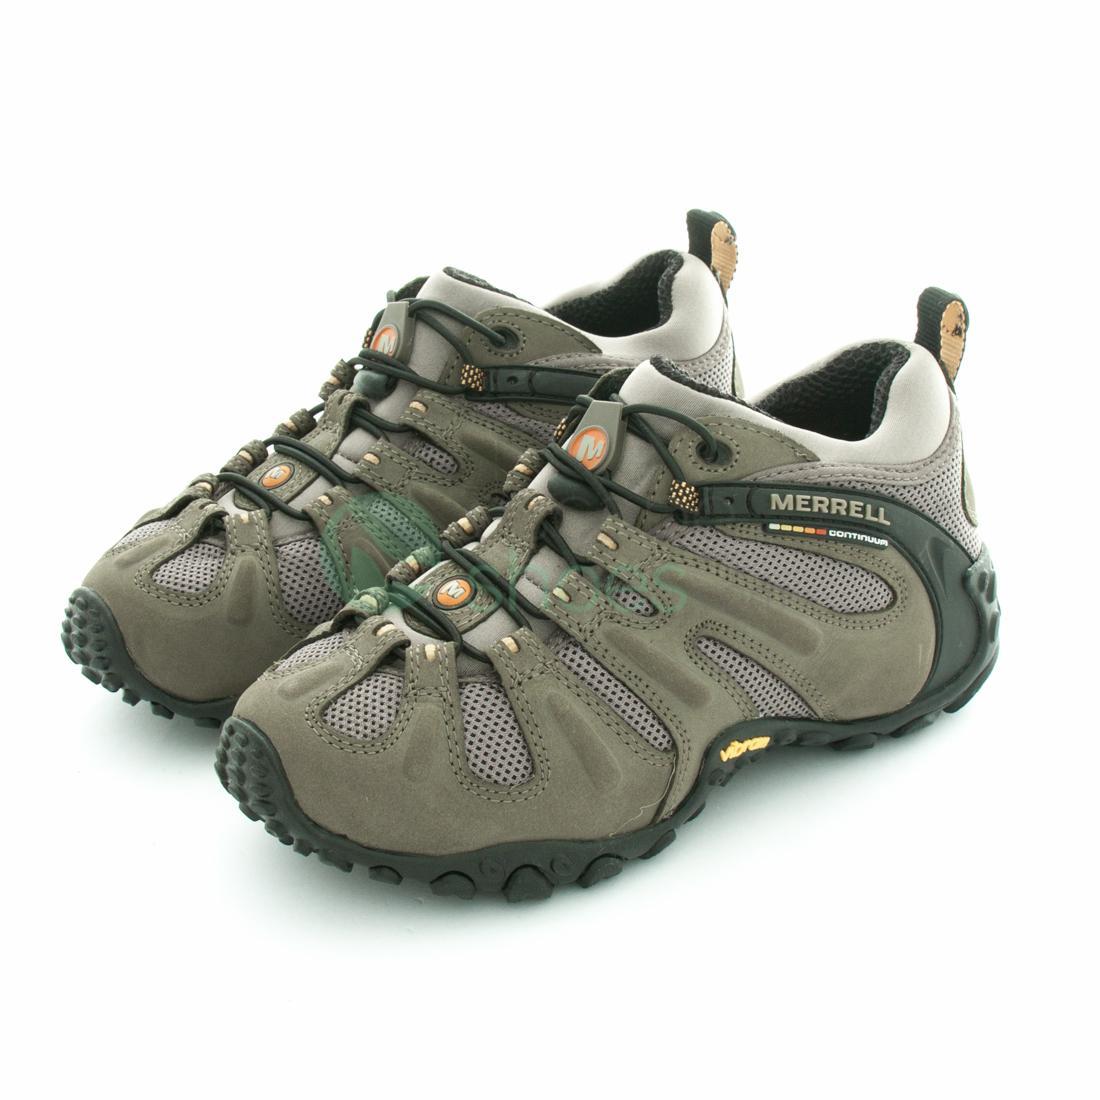 5d88e7f1f8a Buy your Sneakers MERRELL J82572 Chameleon II Stretch Kangaroo Boa ...